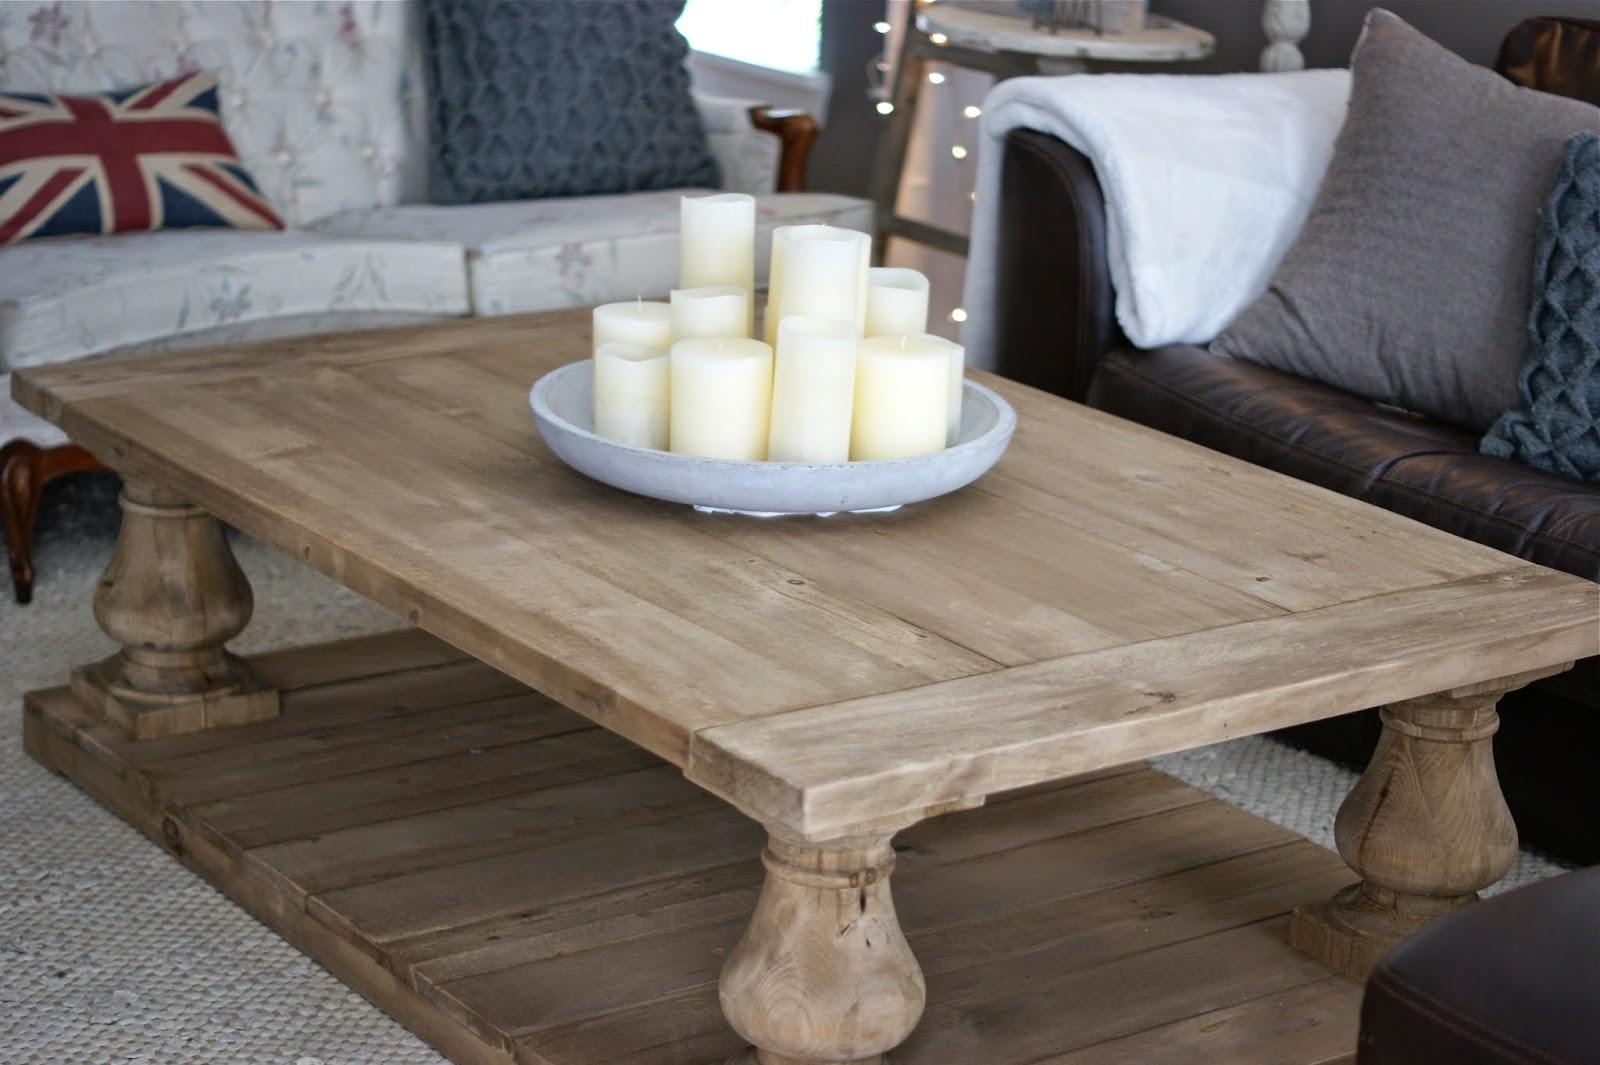 Restoration Hardware Coffee Table.Meggie Frue Meggie Frue At Home Balustrade Coffee Table